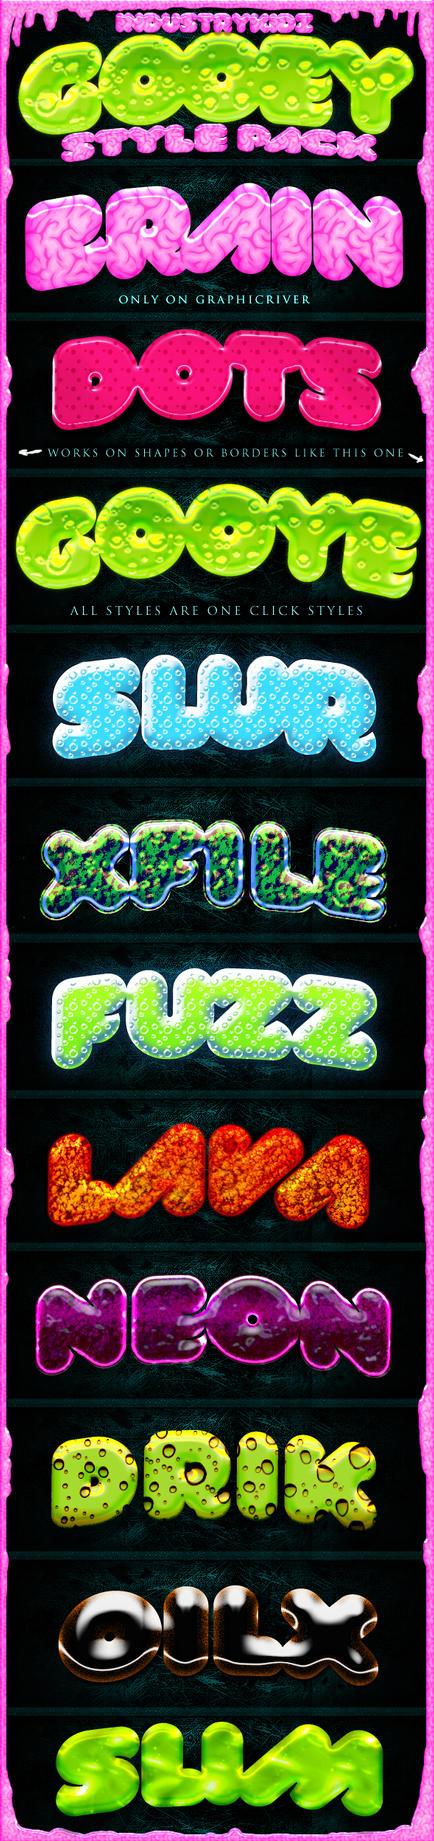 Slime Gooey Photoshop Layer Styles by Industrykidz